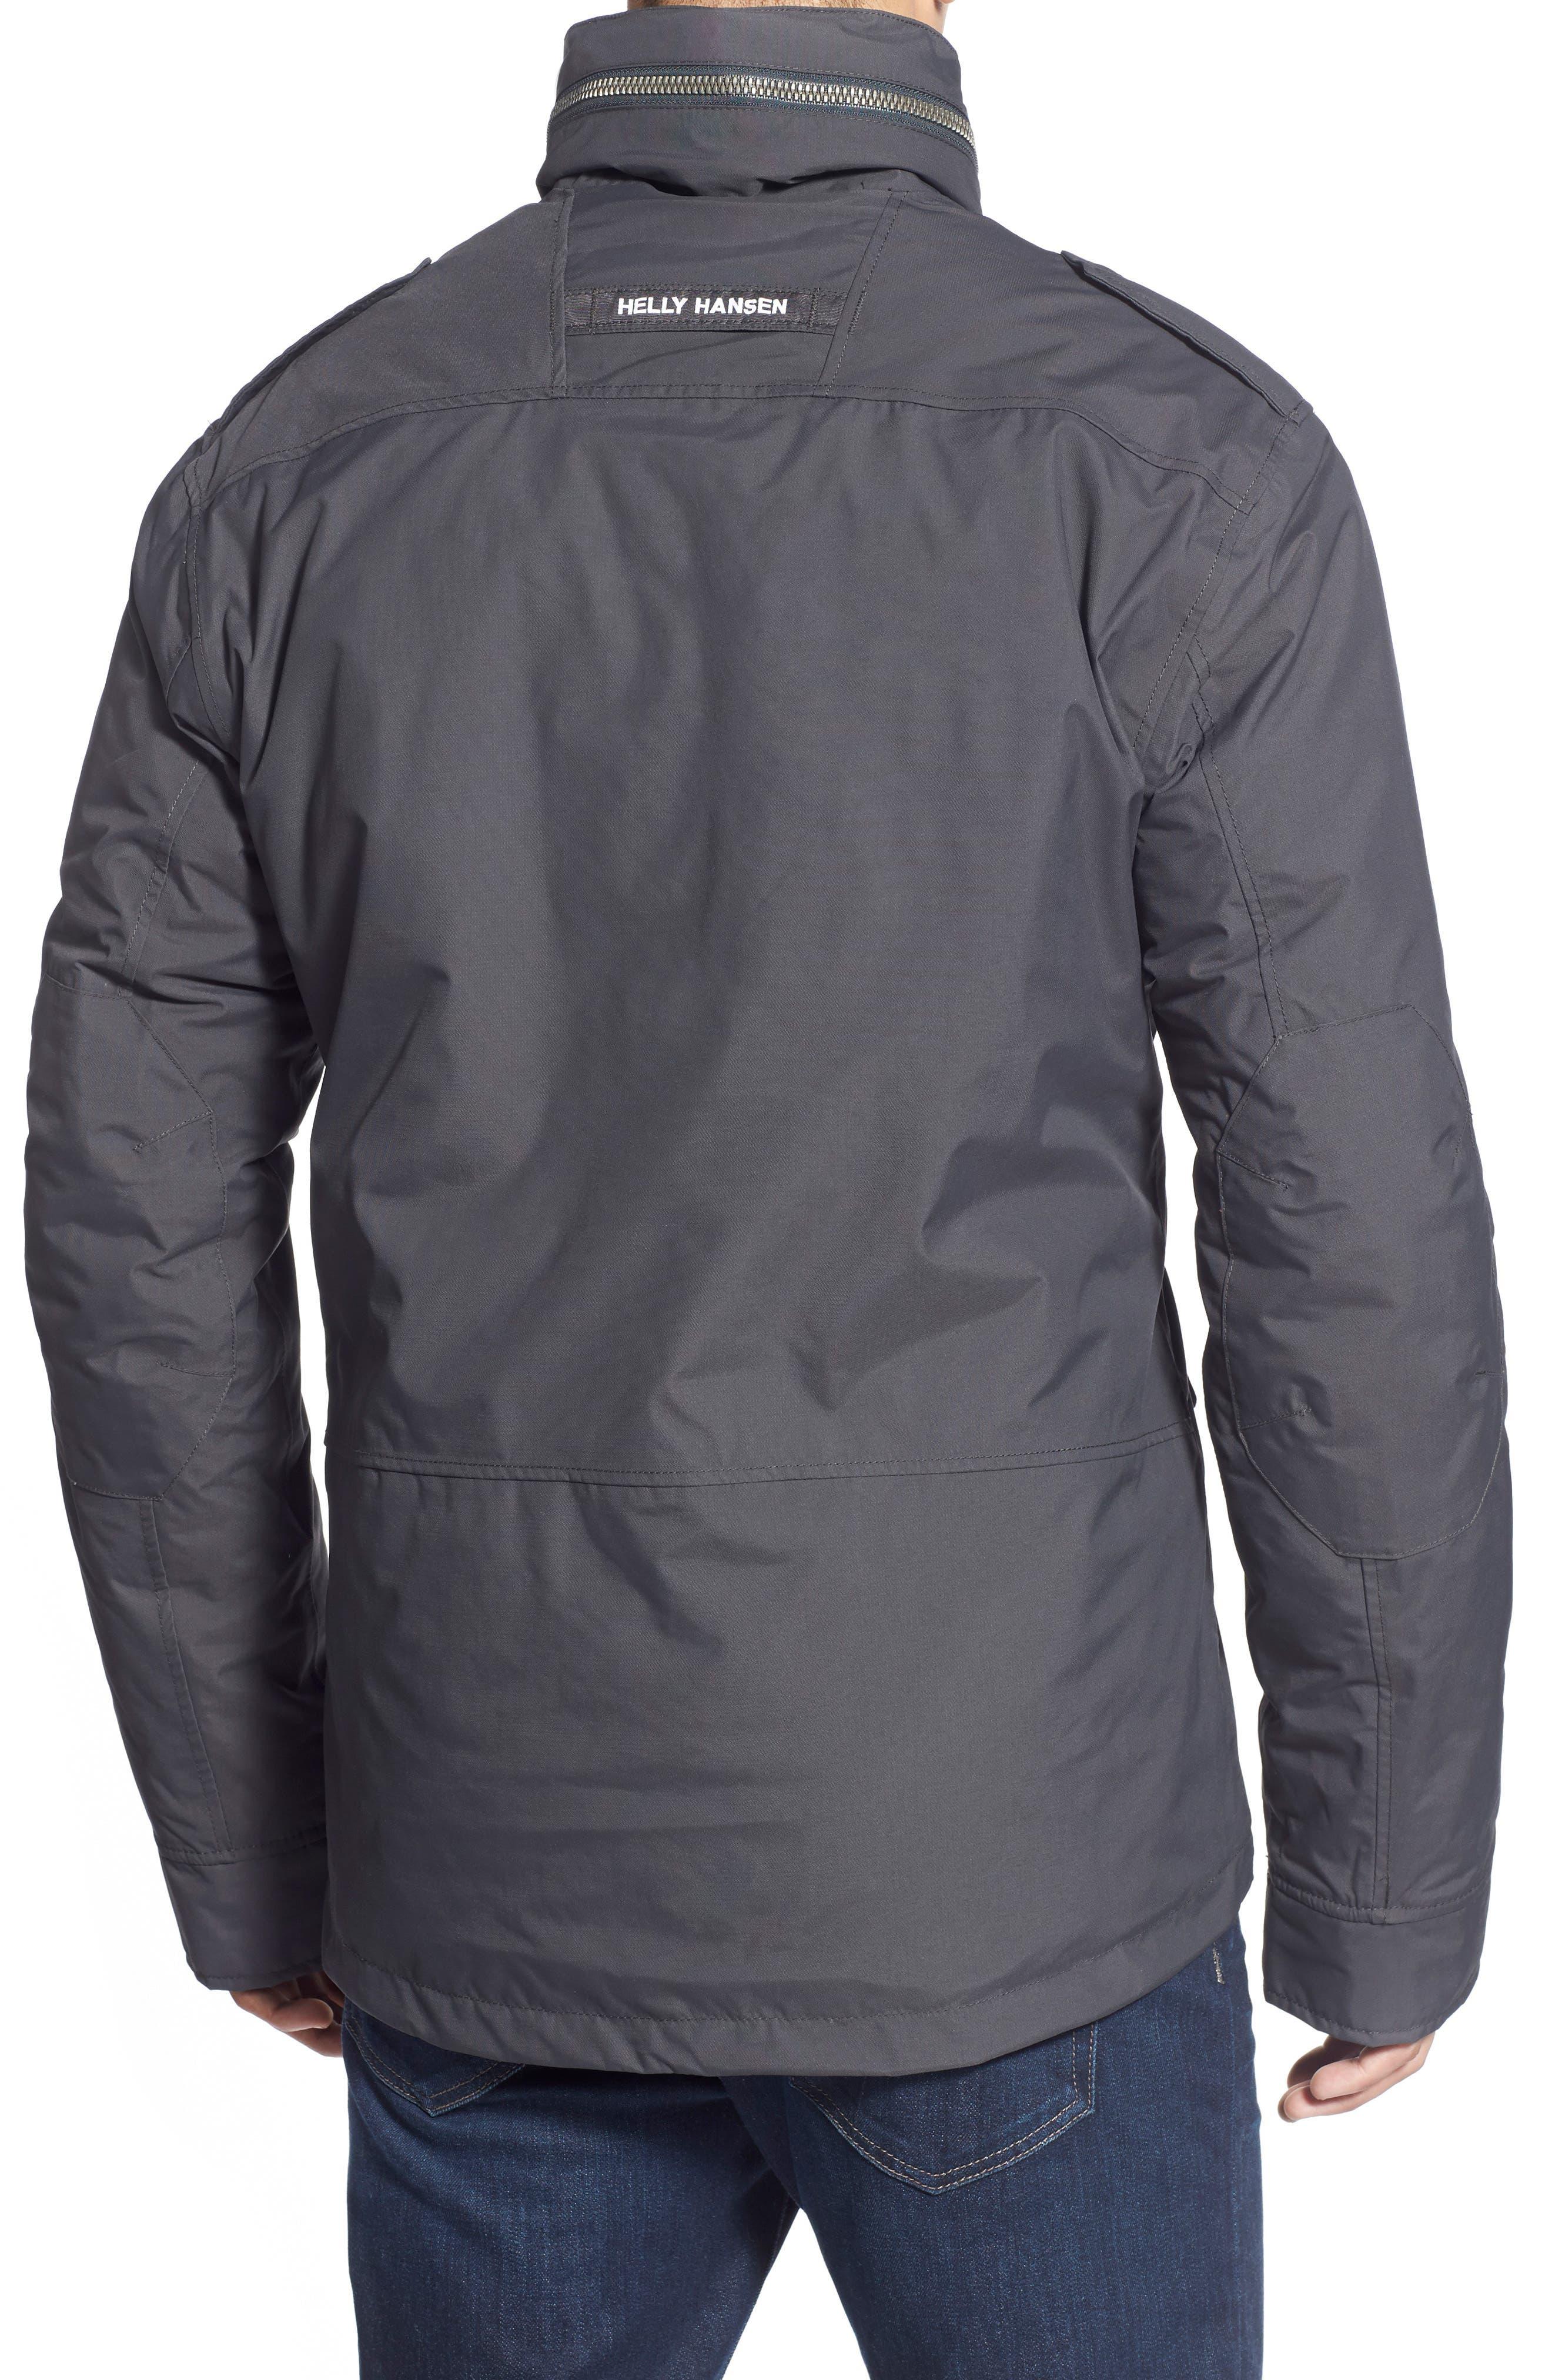 HellyHansen 'Universal' MotoRain Jacket,                             Alternate thumbnail 2, color,                             080